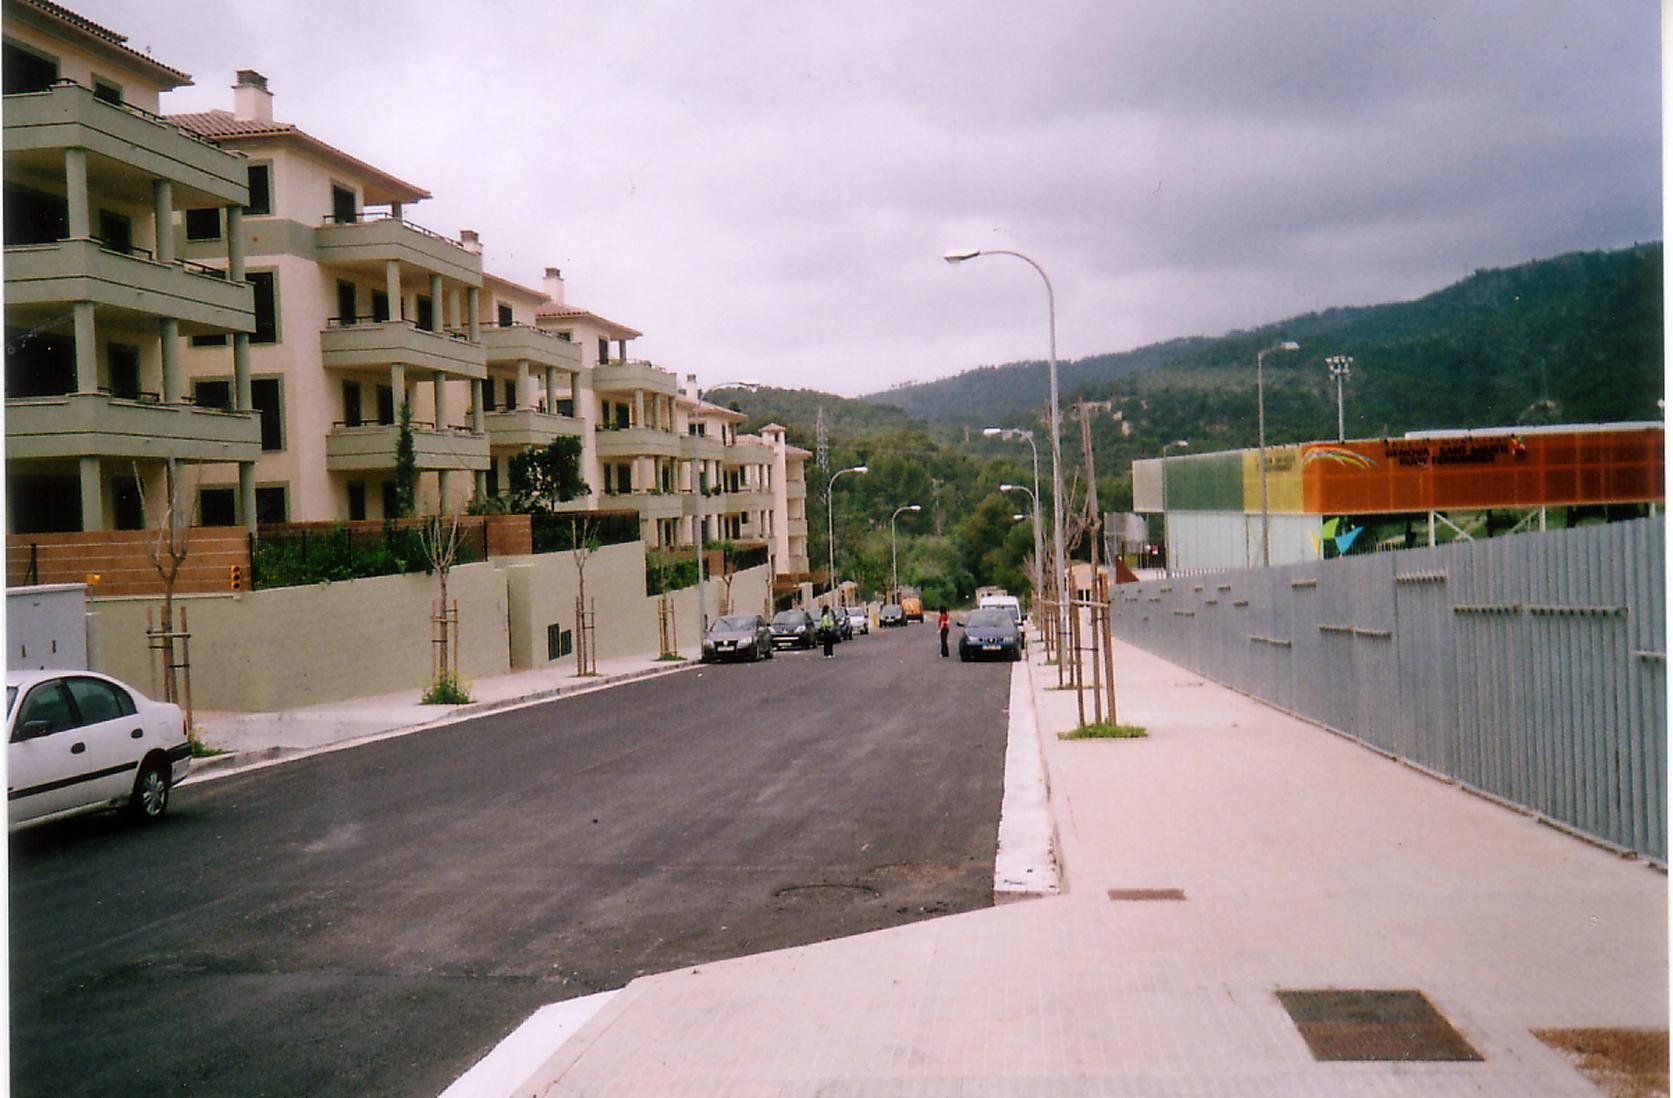 The street Calle Adolfo Vãzquez Humasque